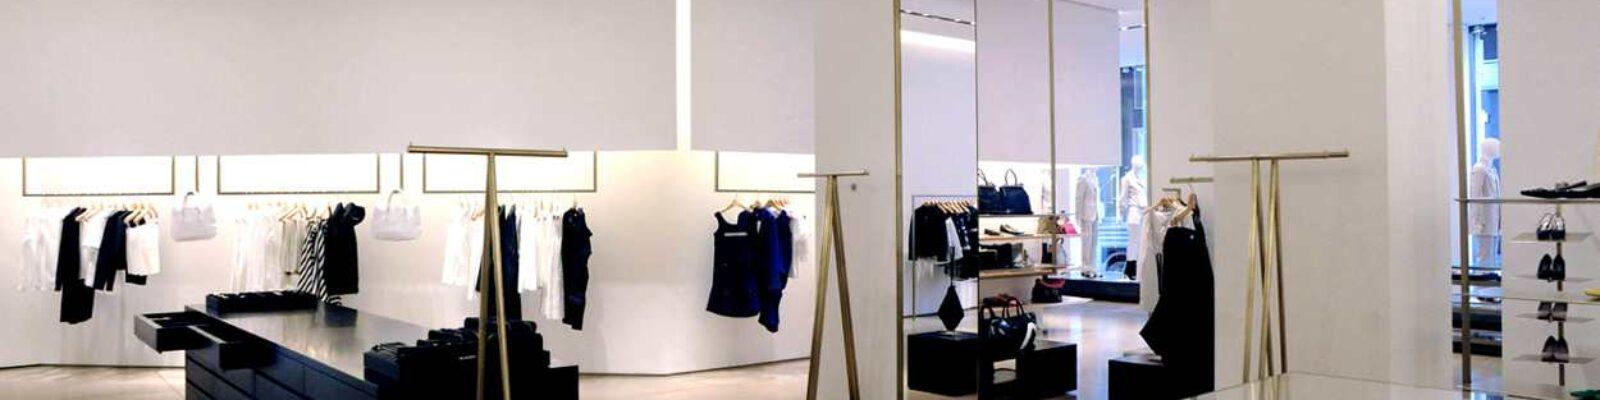 Jil Sander Showroom in Milan - main project view